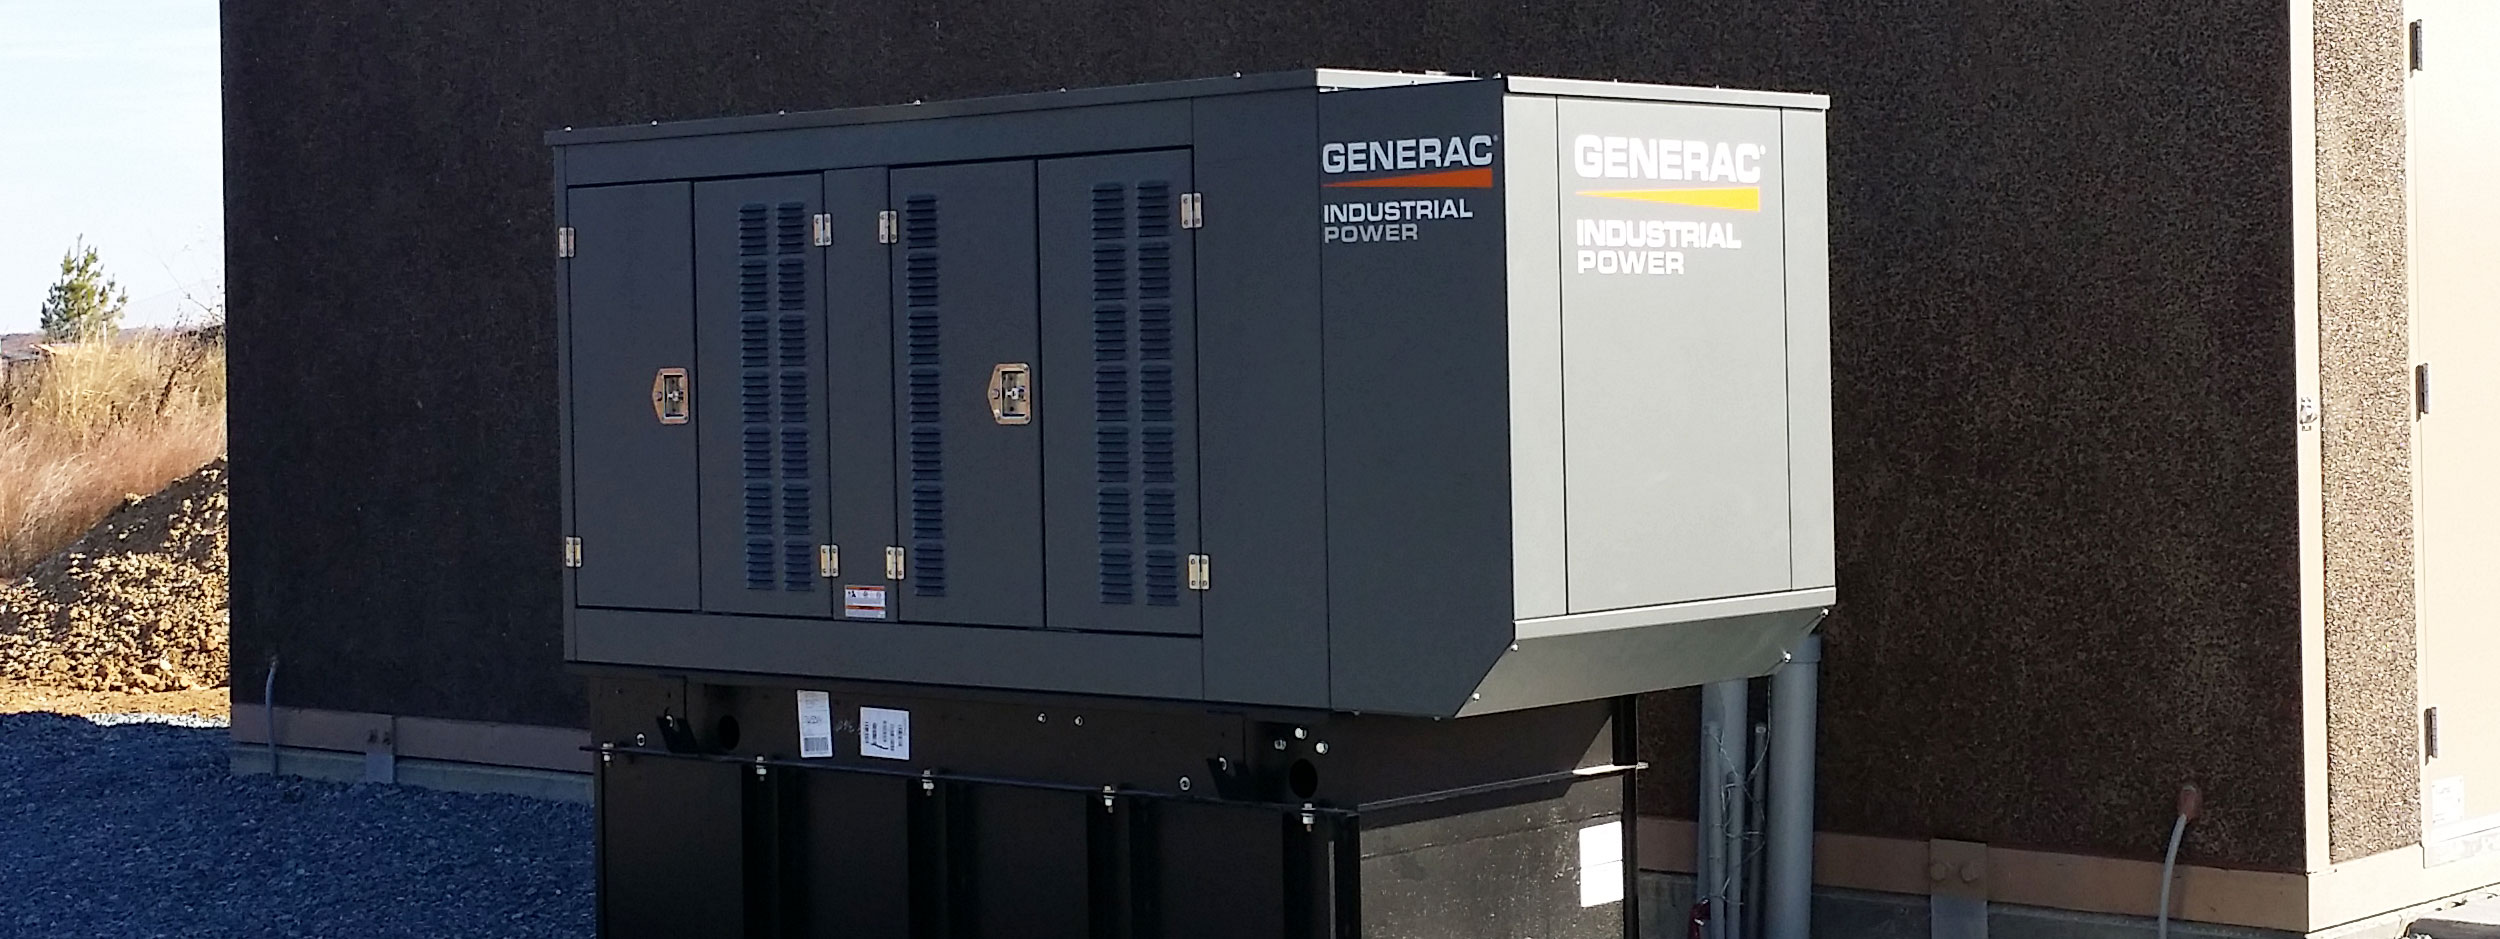 bdc-generator-blog